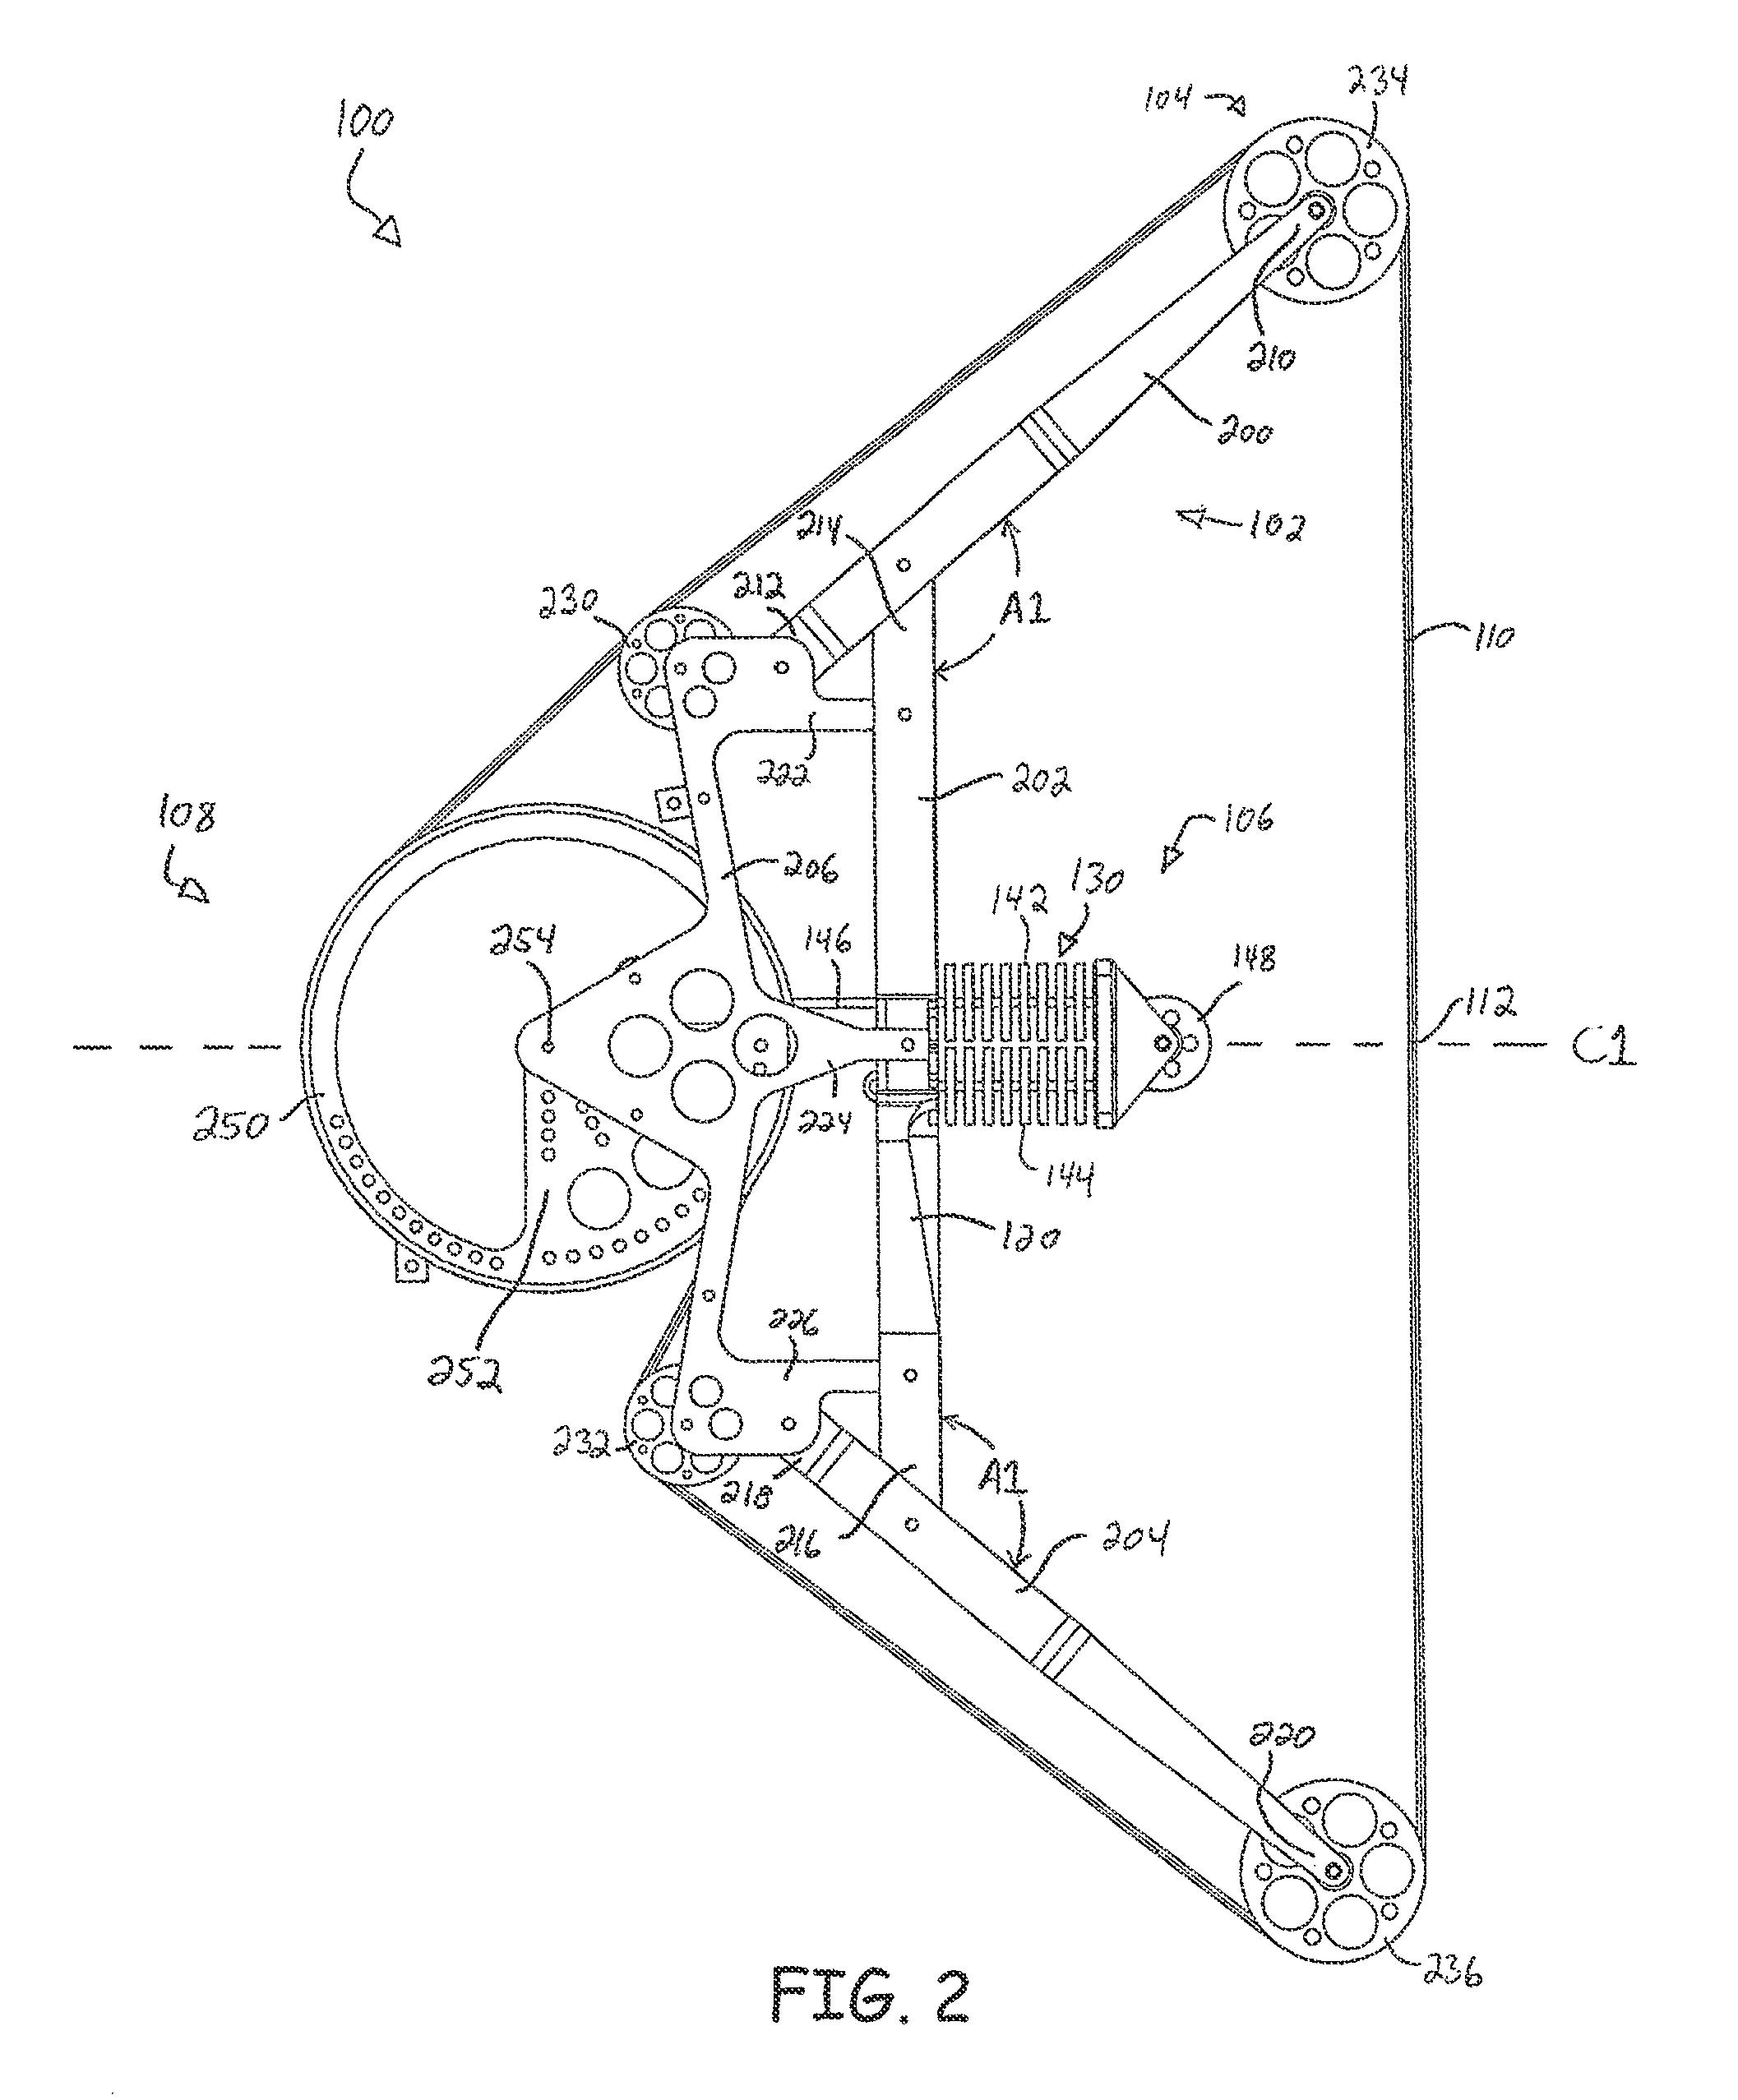 inncom thermostat wiring diagram